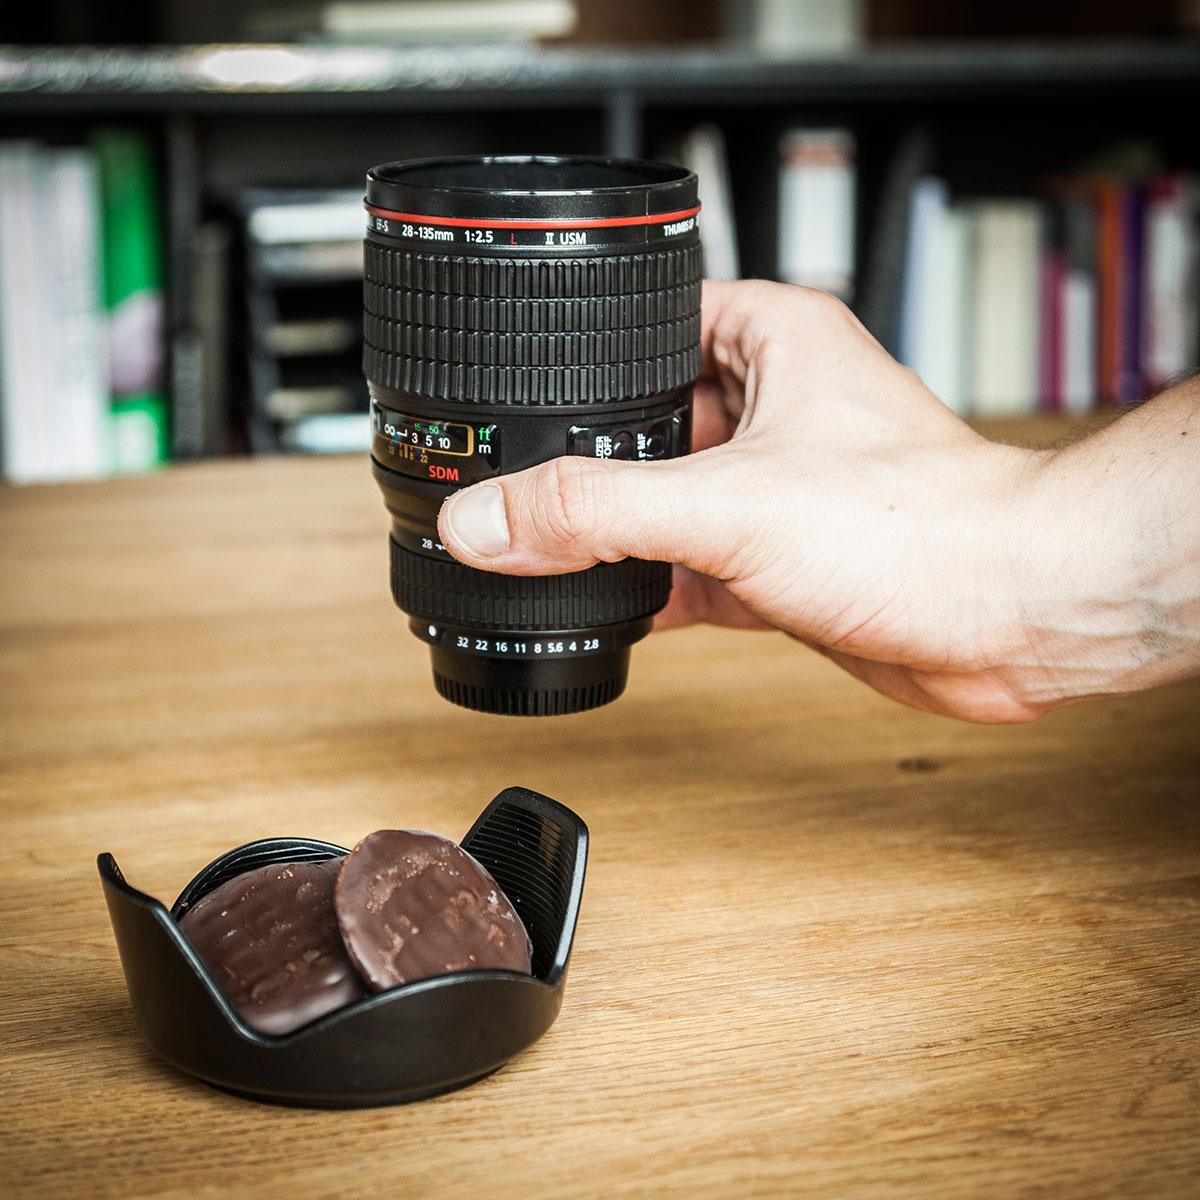 Gobelet objectif photographique